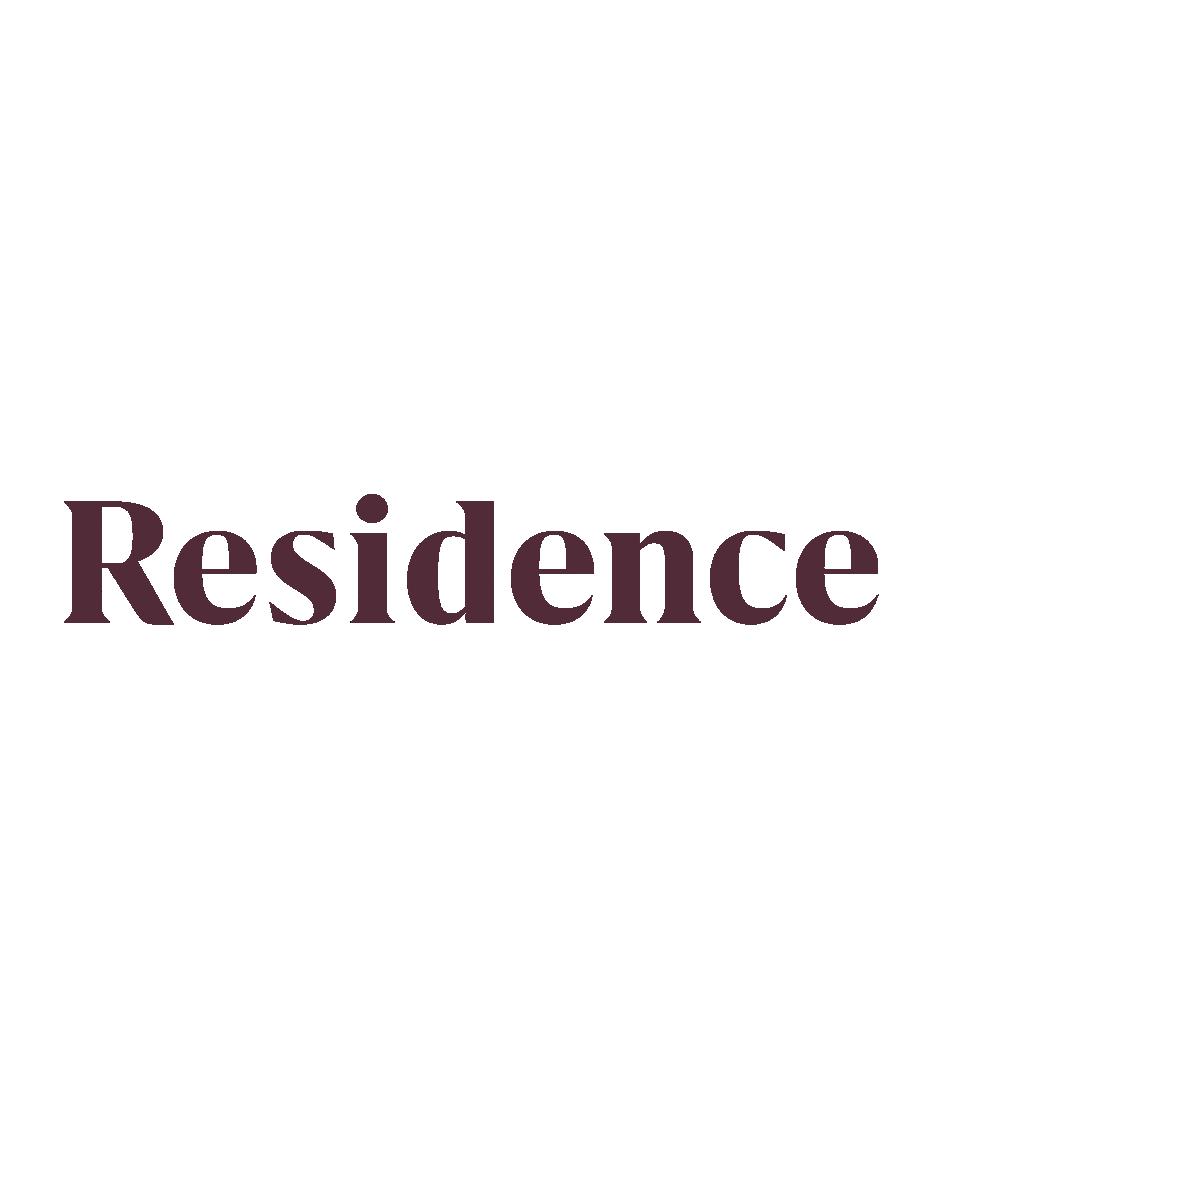 Residence Inn logo HoCoSo Track record